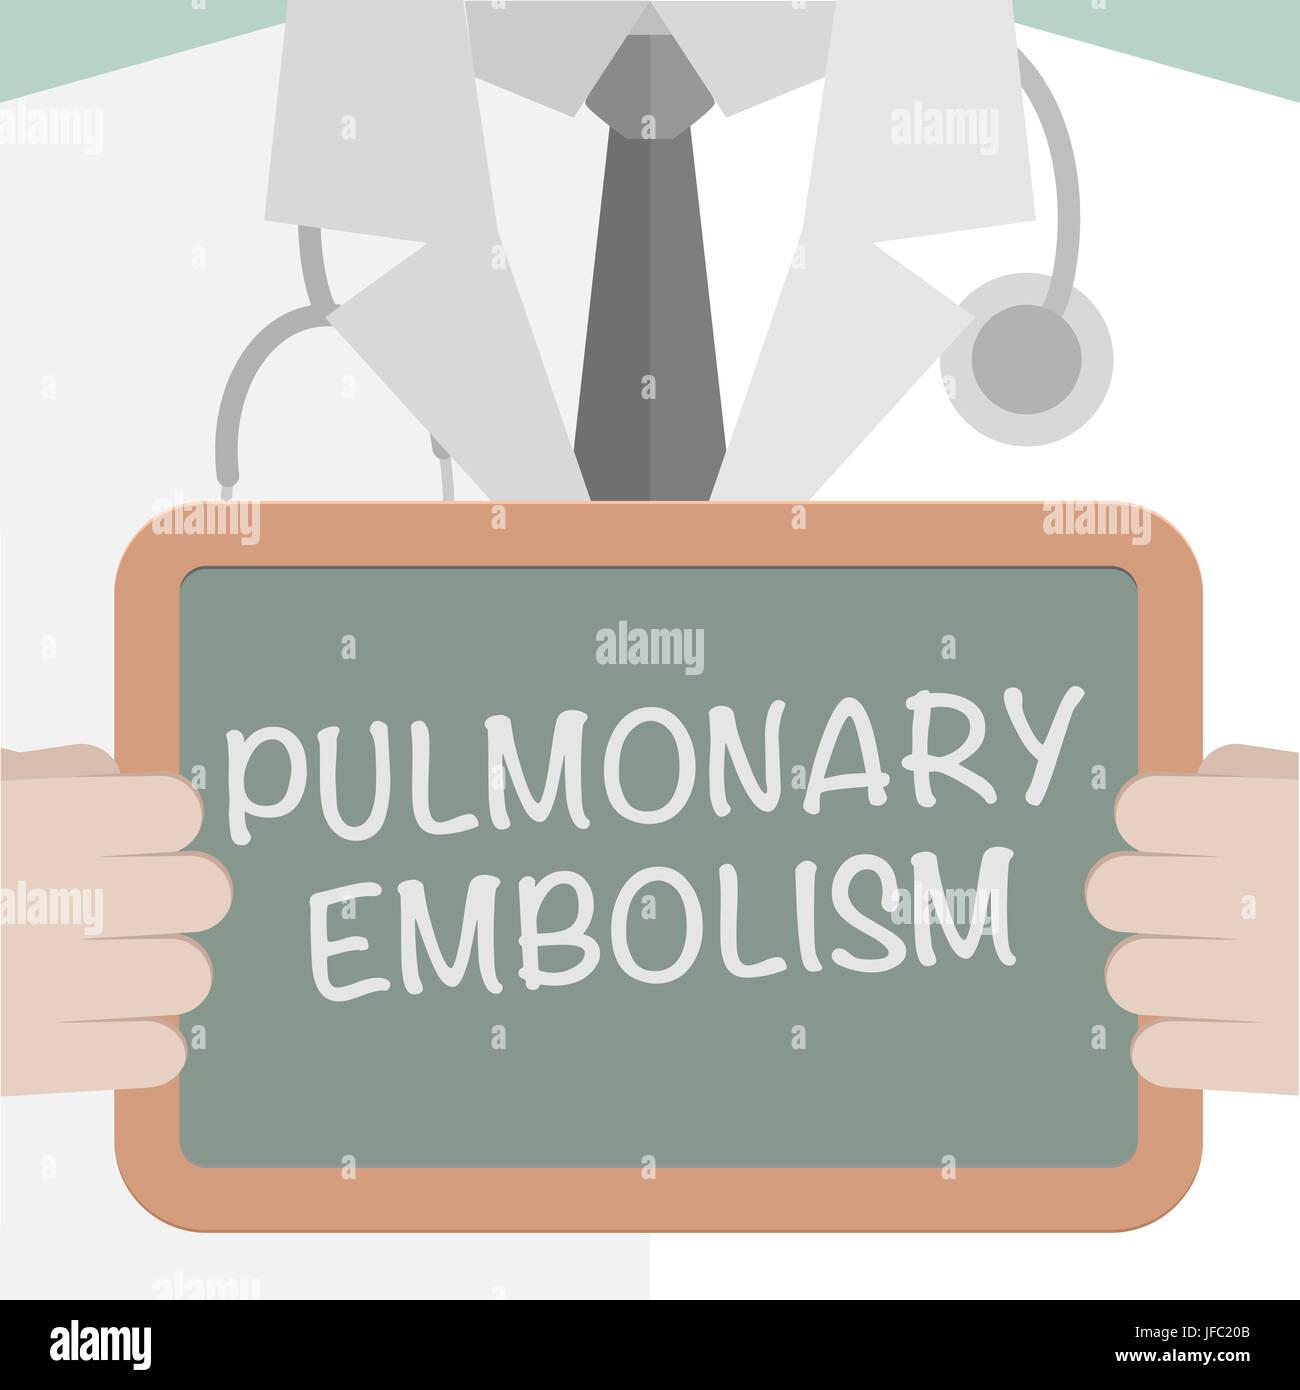 Board Pulmonary Embolism - Stock Image